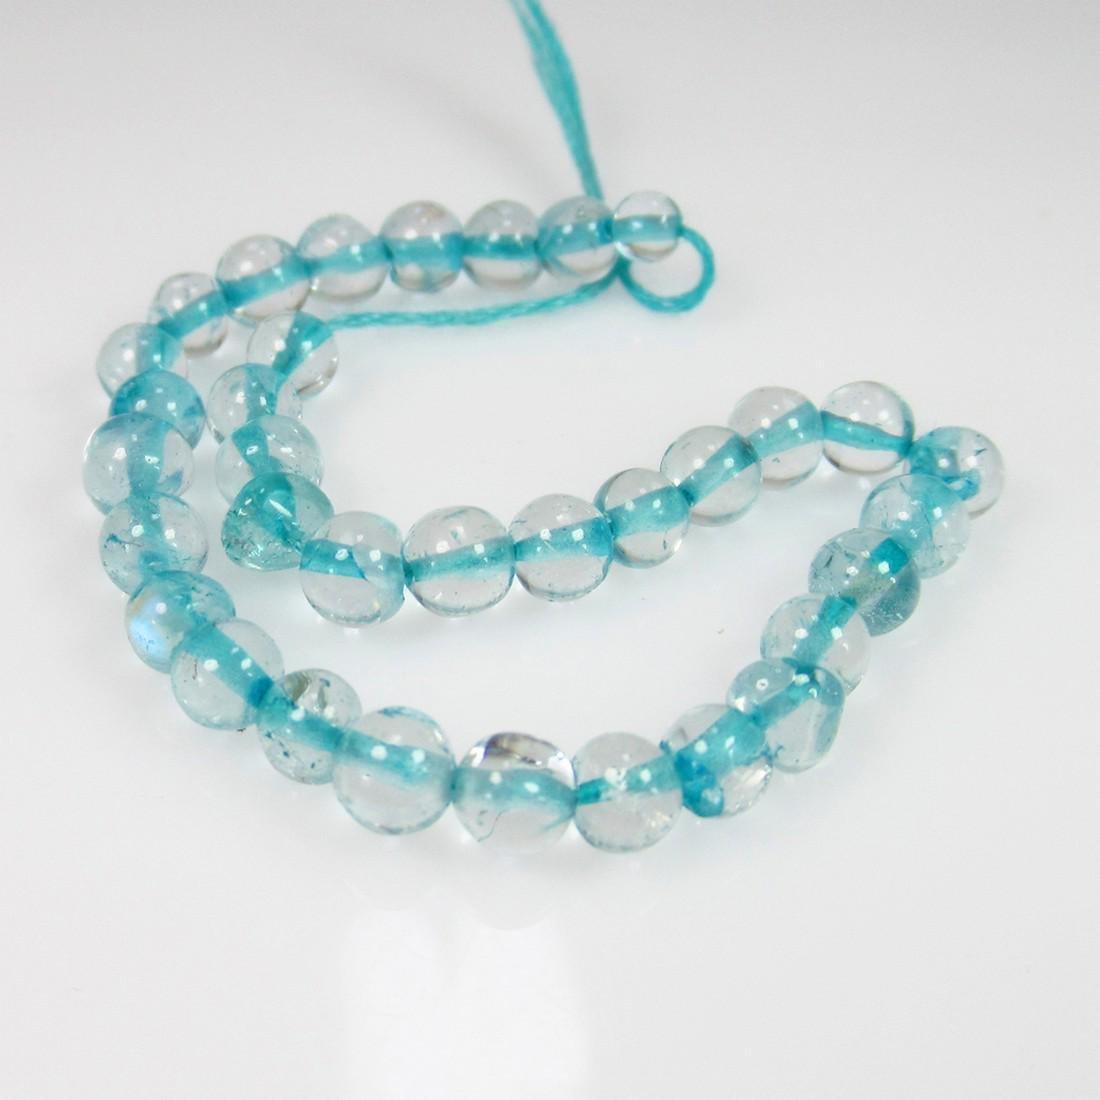 10.34 Ct Genuine 30 Drilled White Topaz Ball Beads